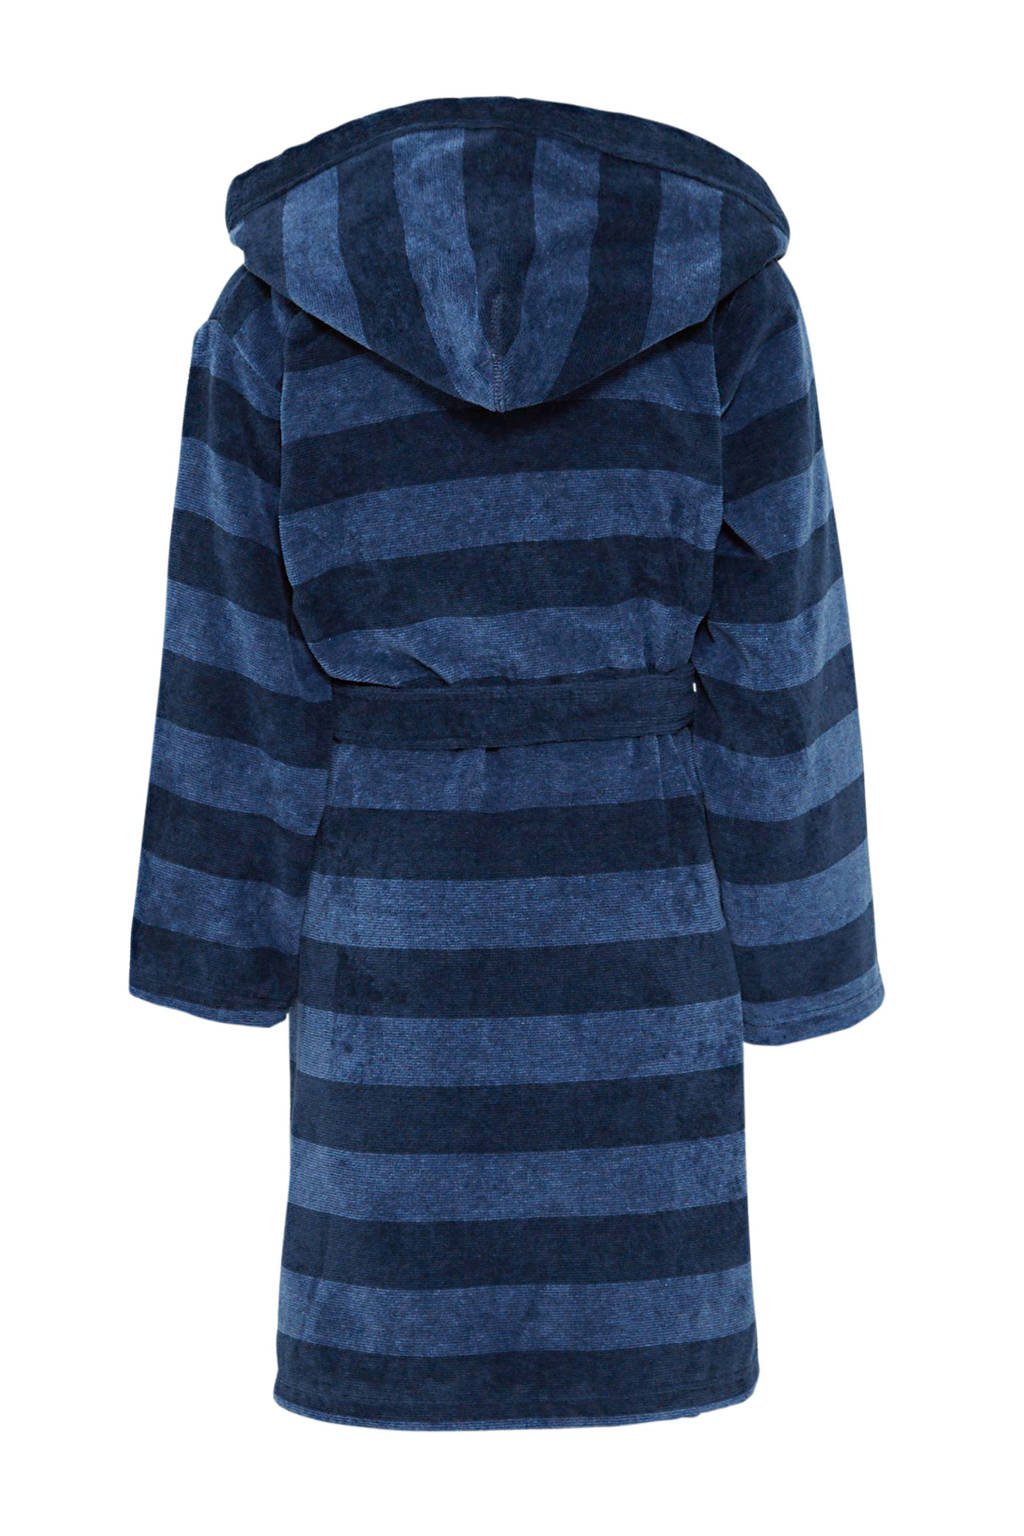 C&A Here & There   badjas blauw/donkerblauw, Donkerblauw